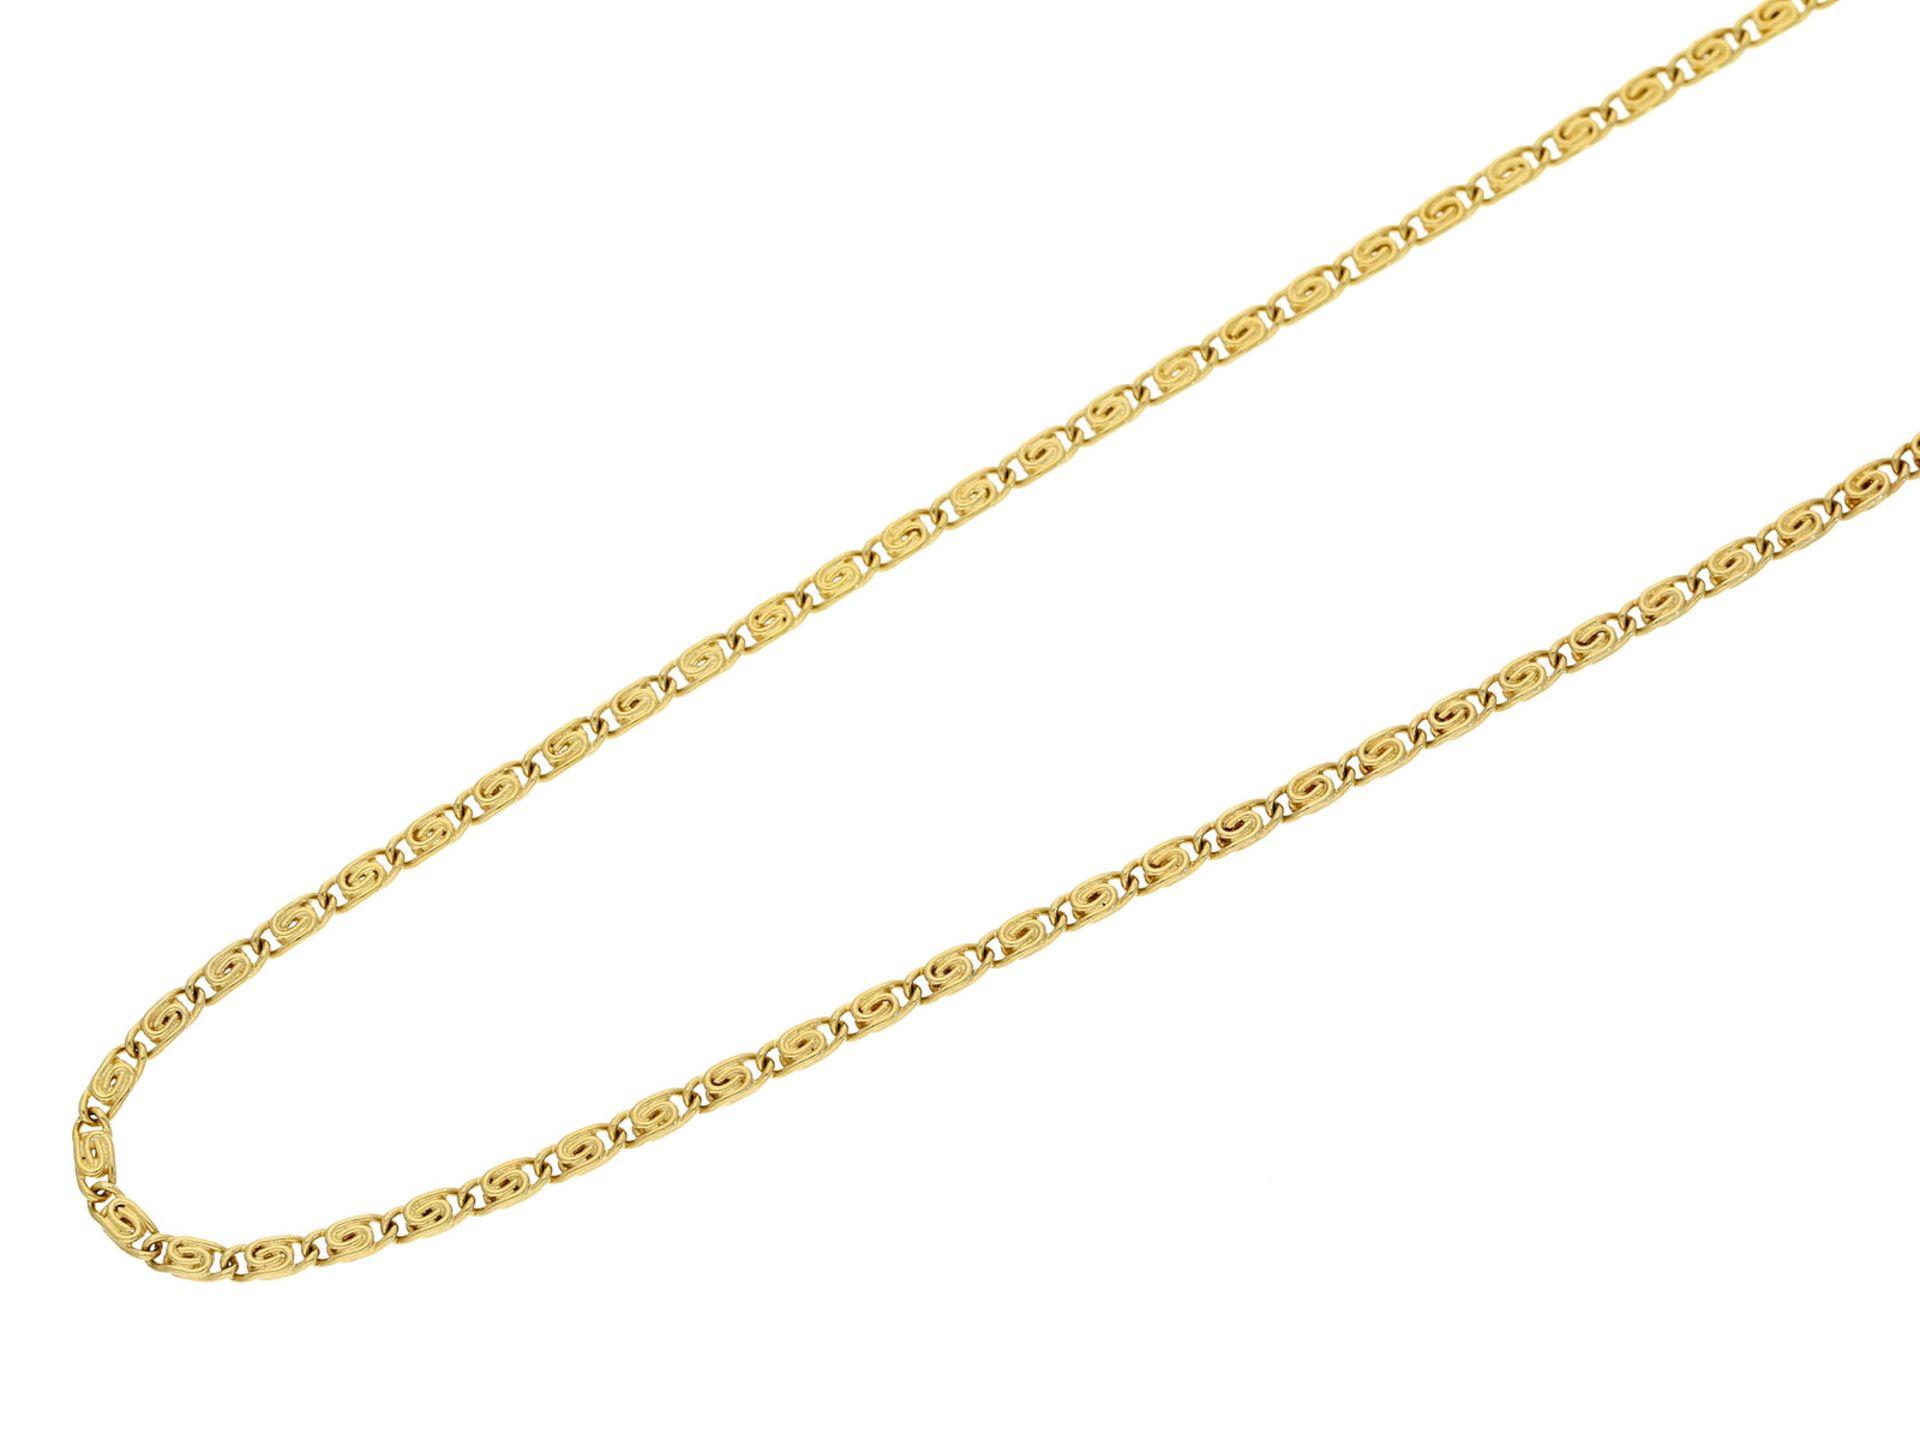 Kette/Collier: lange goldene CollierketteCa. 70cm lang, ca. 10,6g, 14K Gold, ca. 2mm breit,